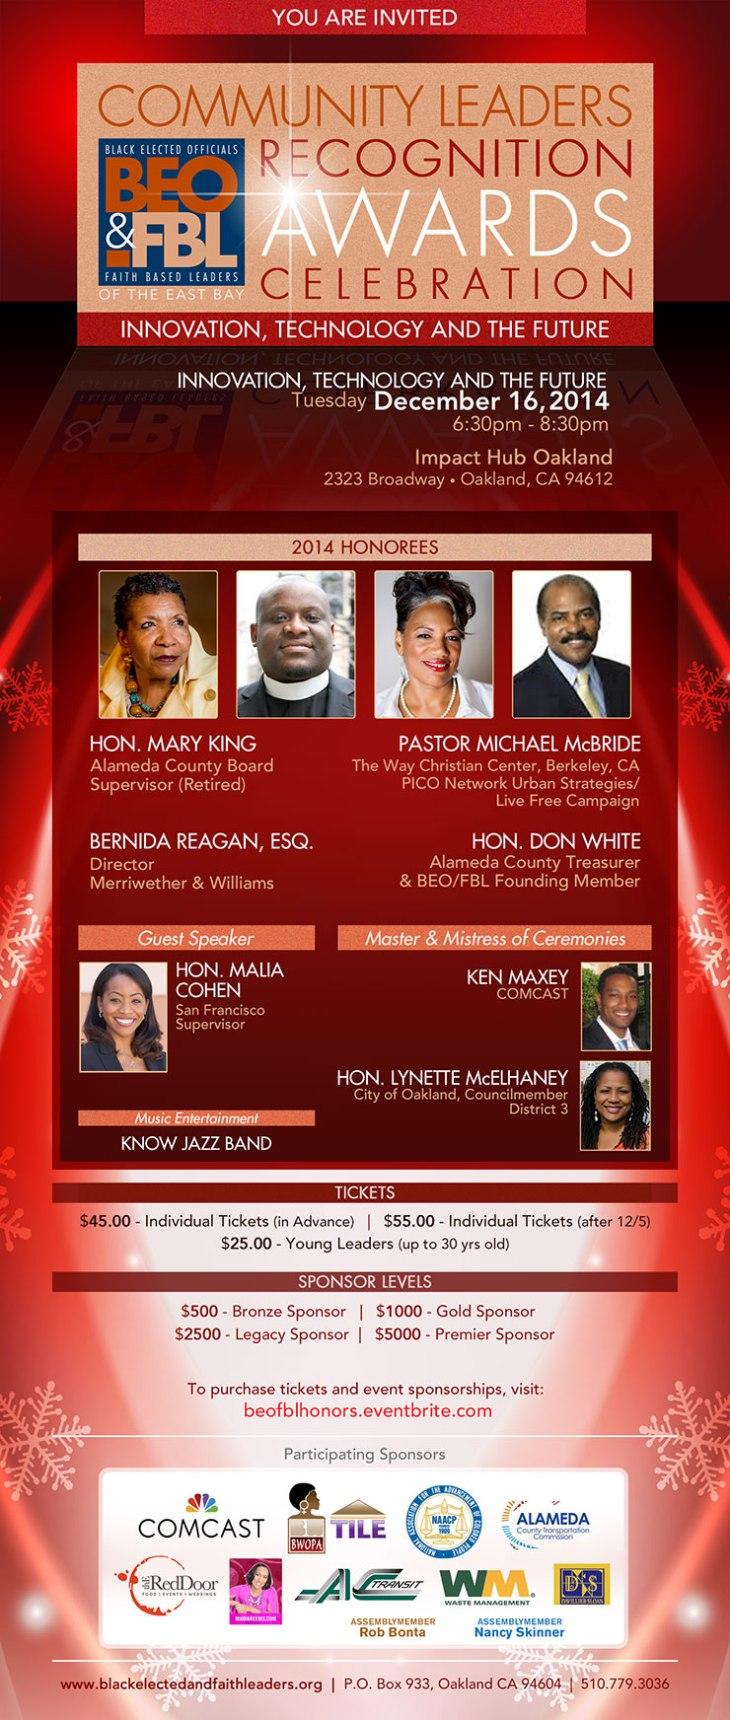 AwardsInvite2014_v5c